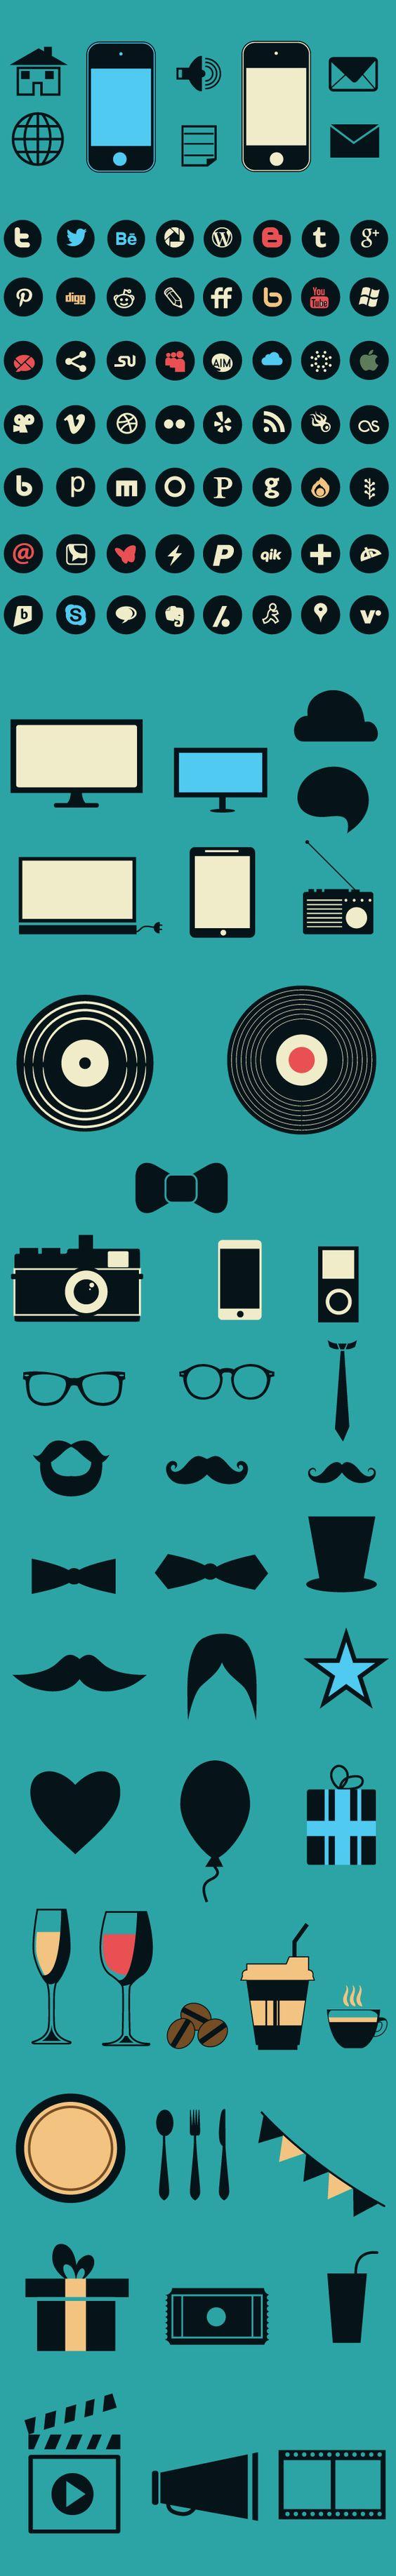 designtnt-social-media-flat-vector-elements-large.jpg (630×4102)